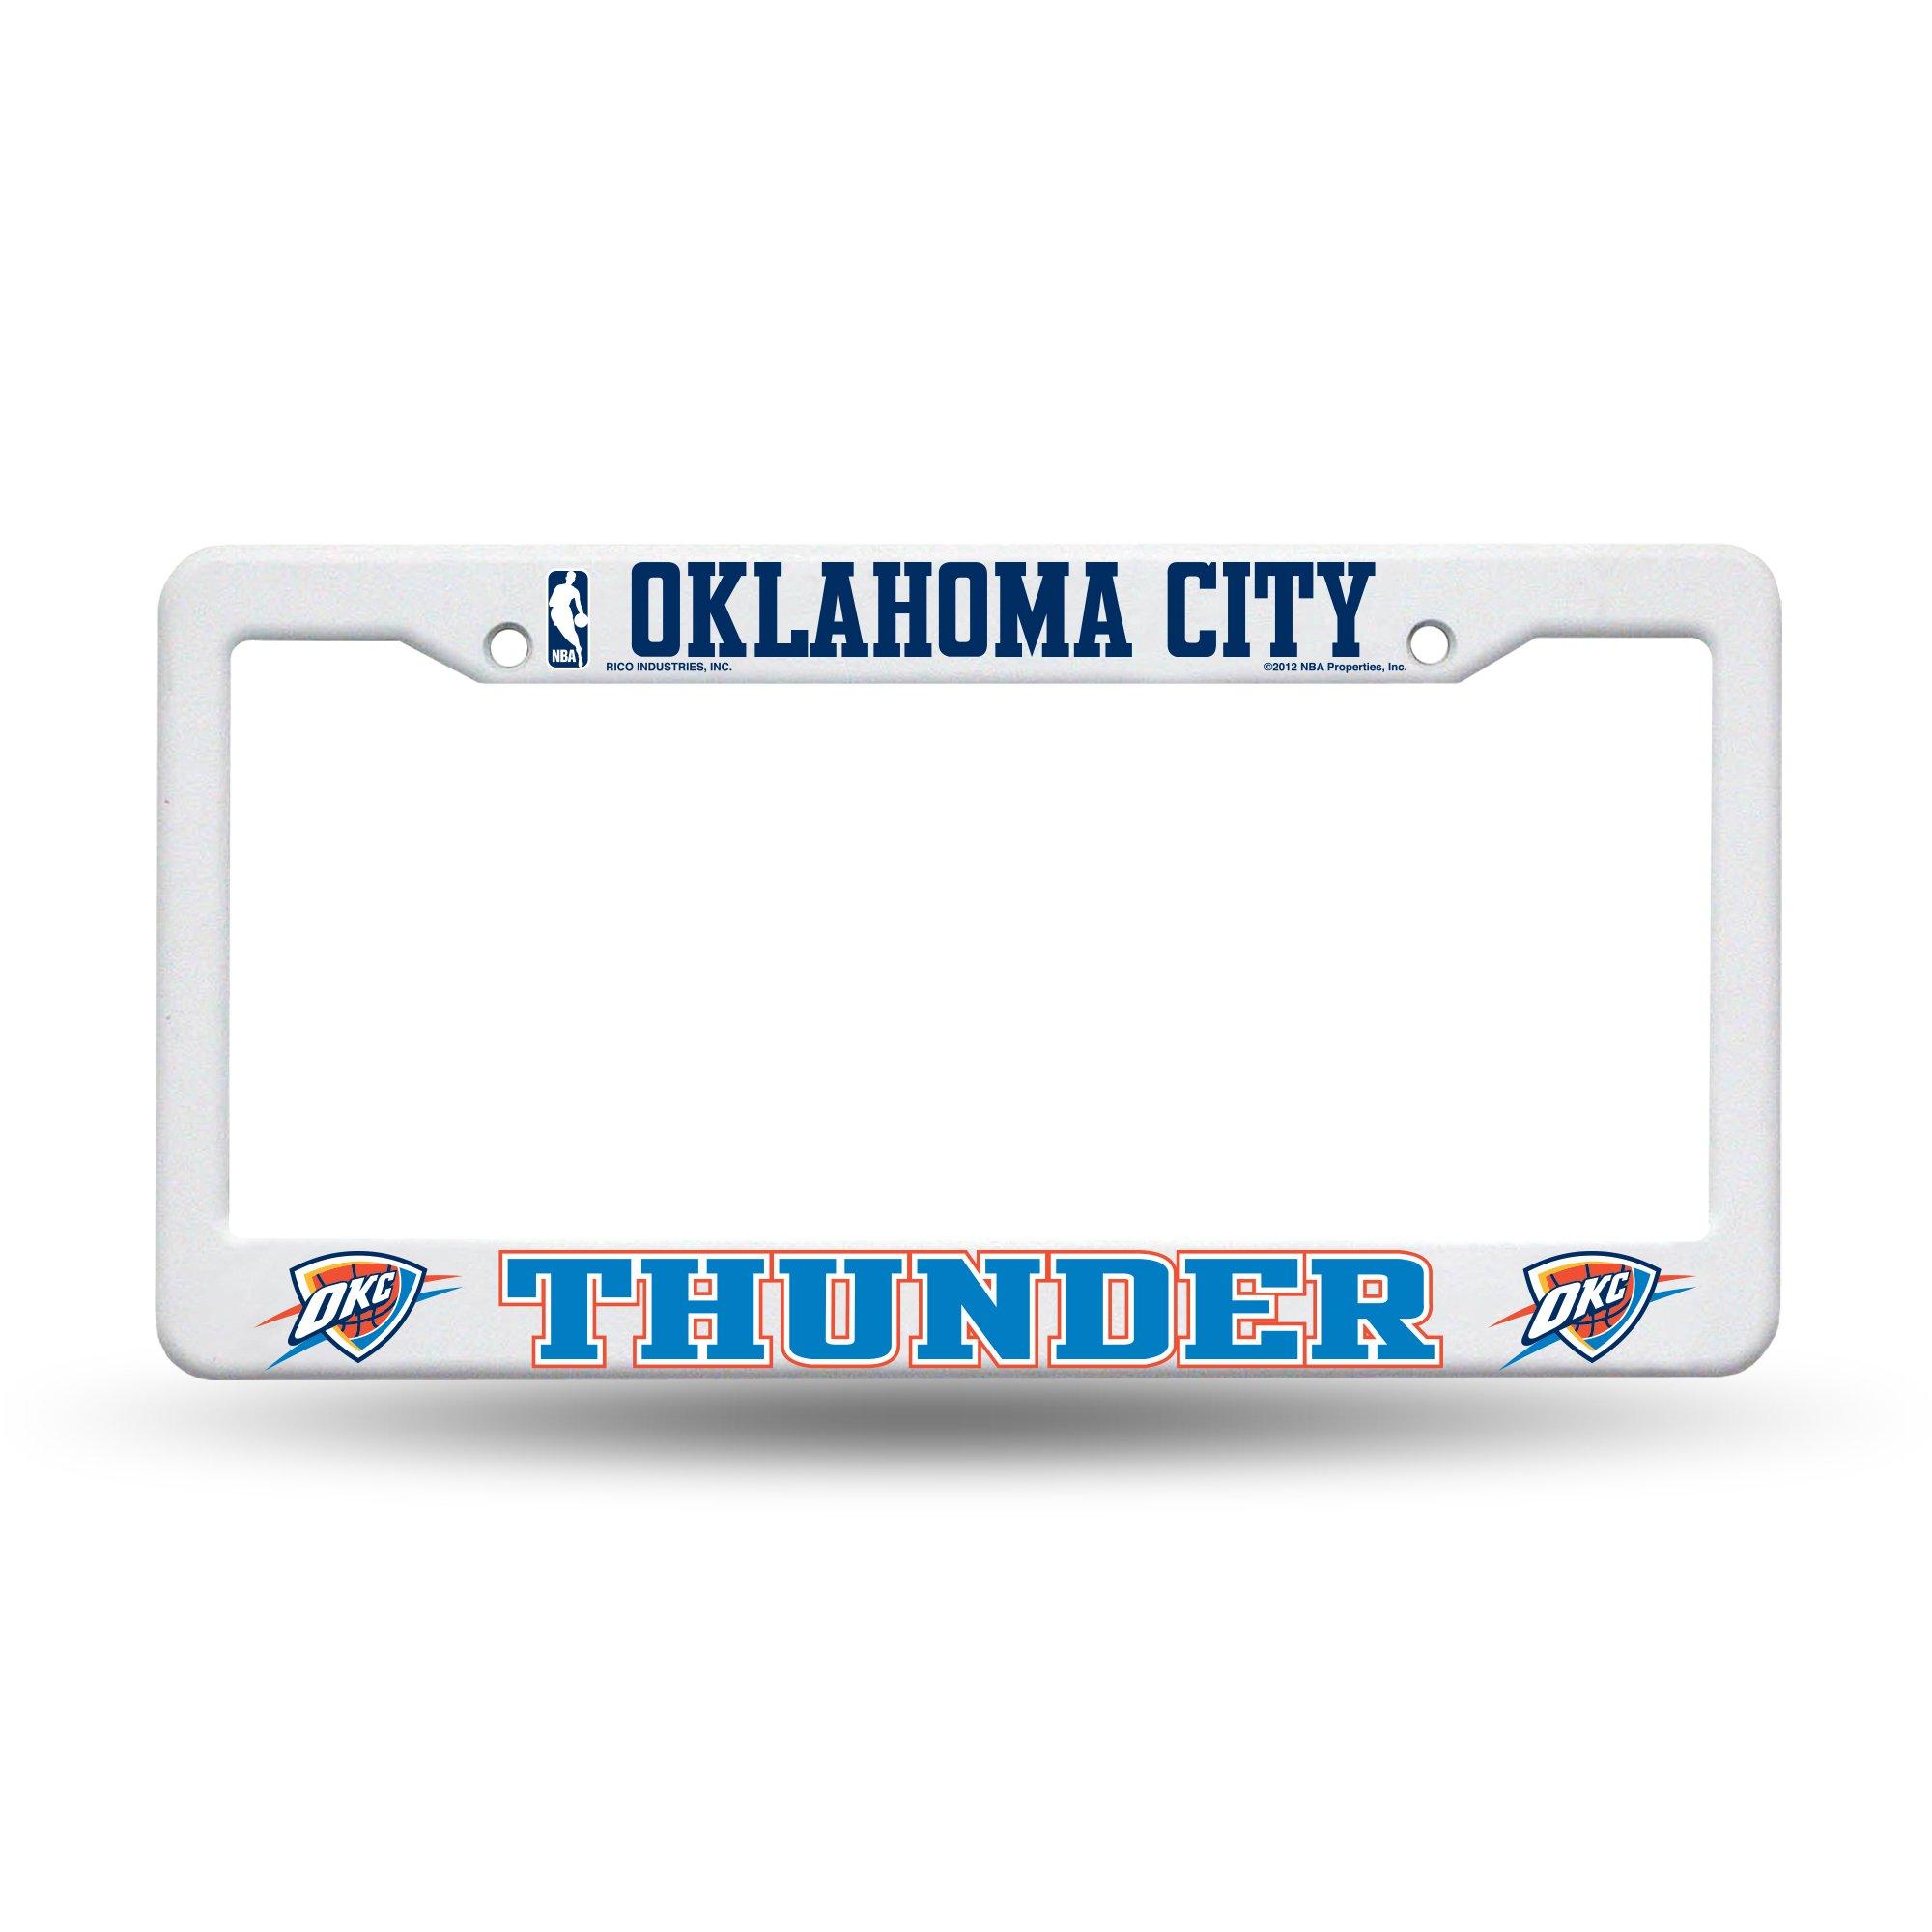 NBA Oklahoma City Thunder Plastic License Plate Frame - White